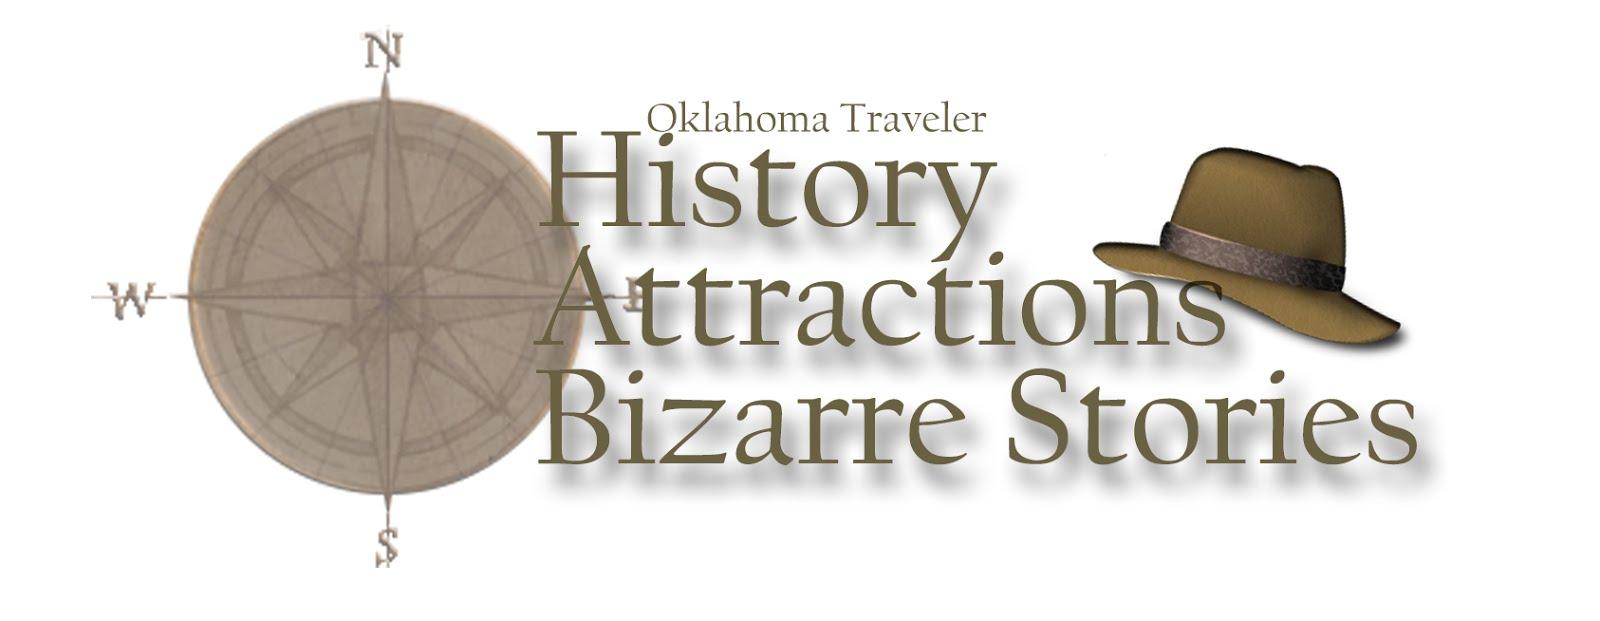 Oklahoma Traveler